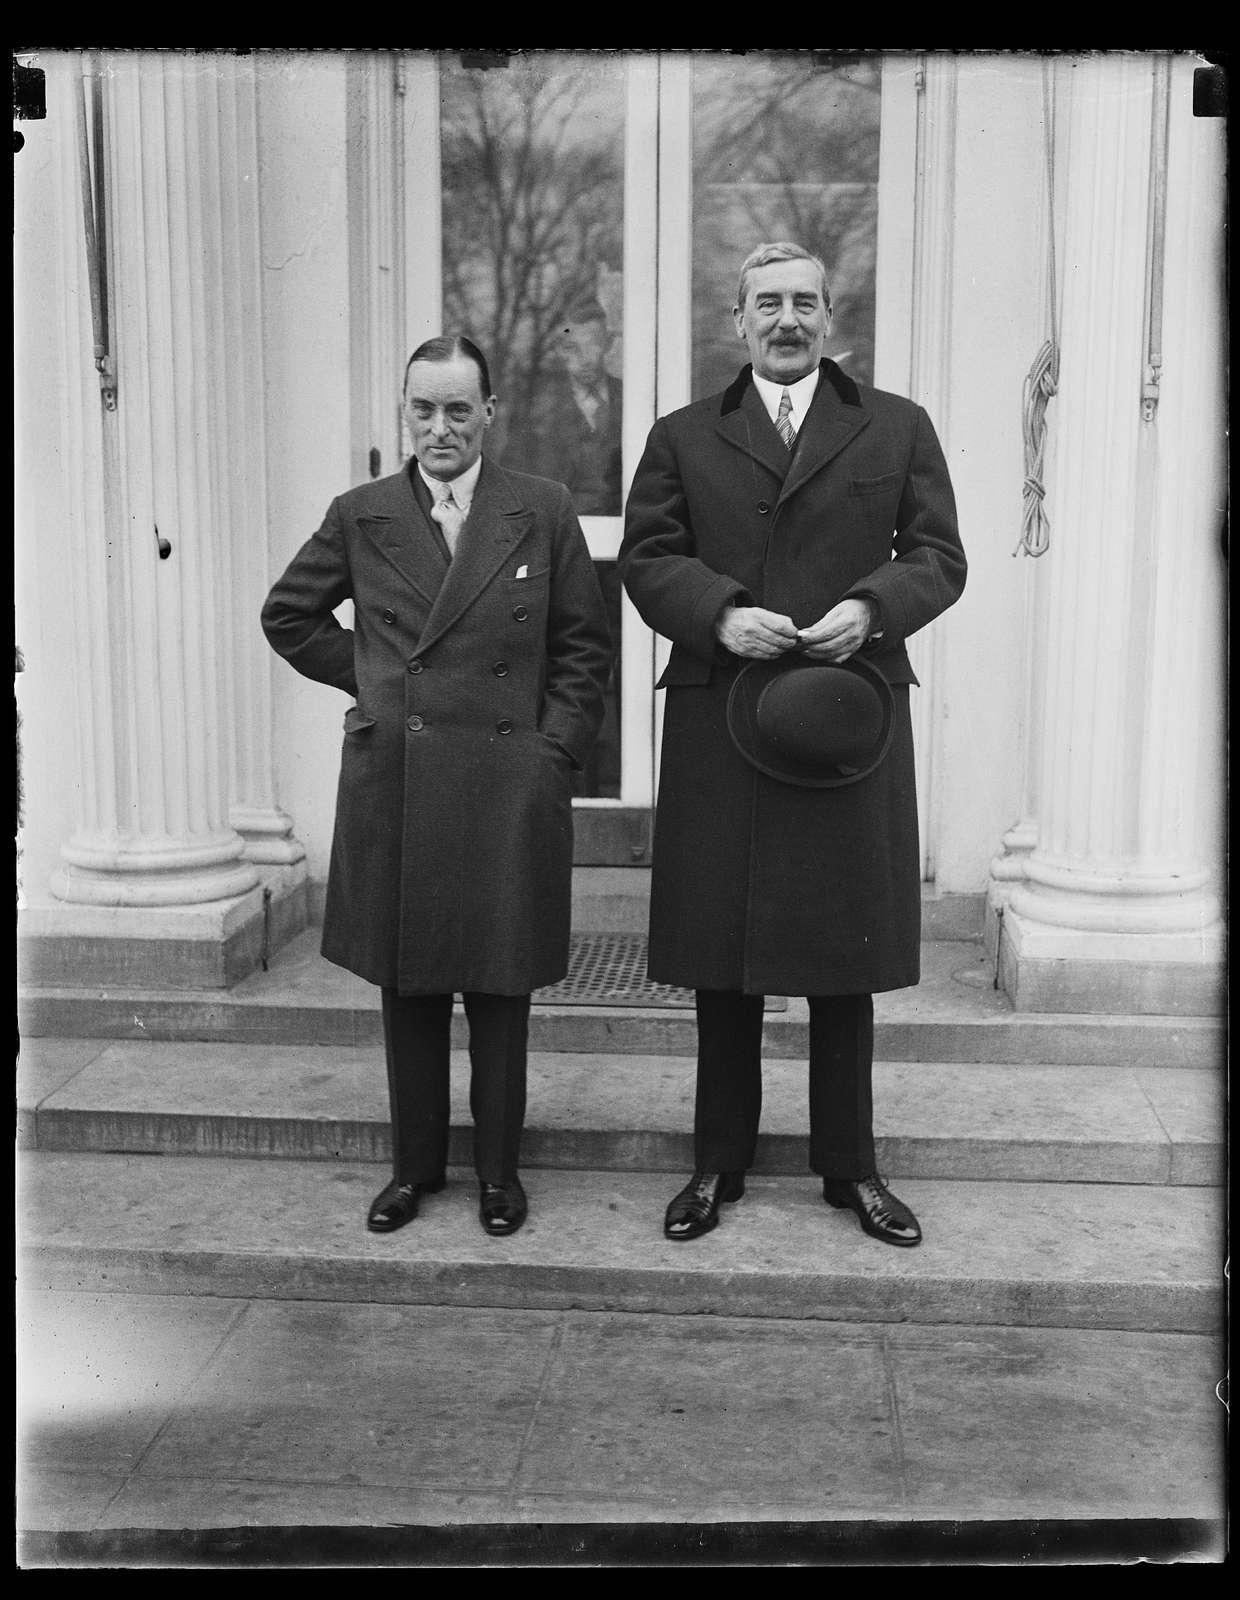 Men at White House, Washington, D.C.